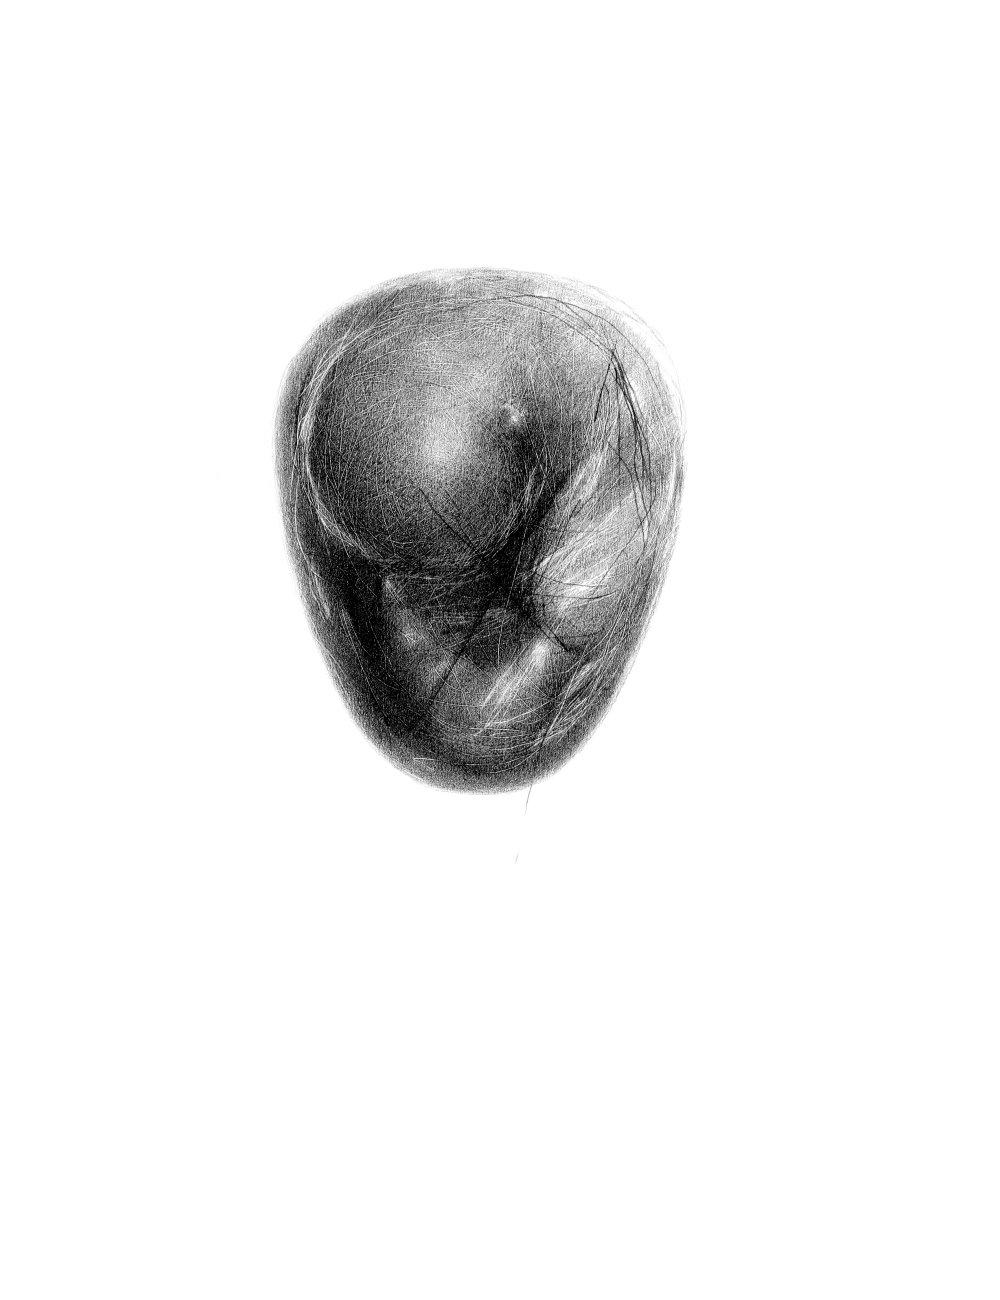 Zárodok (Ryba smrdí od hlavy), 2015, kresba ceruzkou, 390x300mm